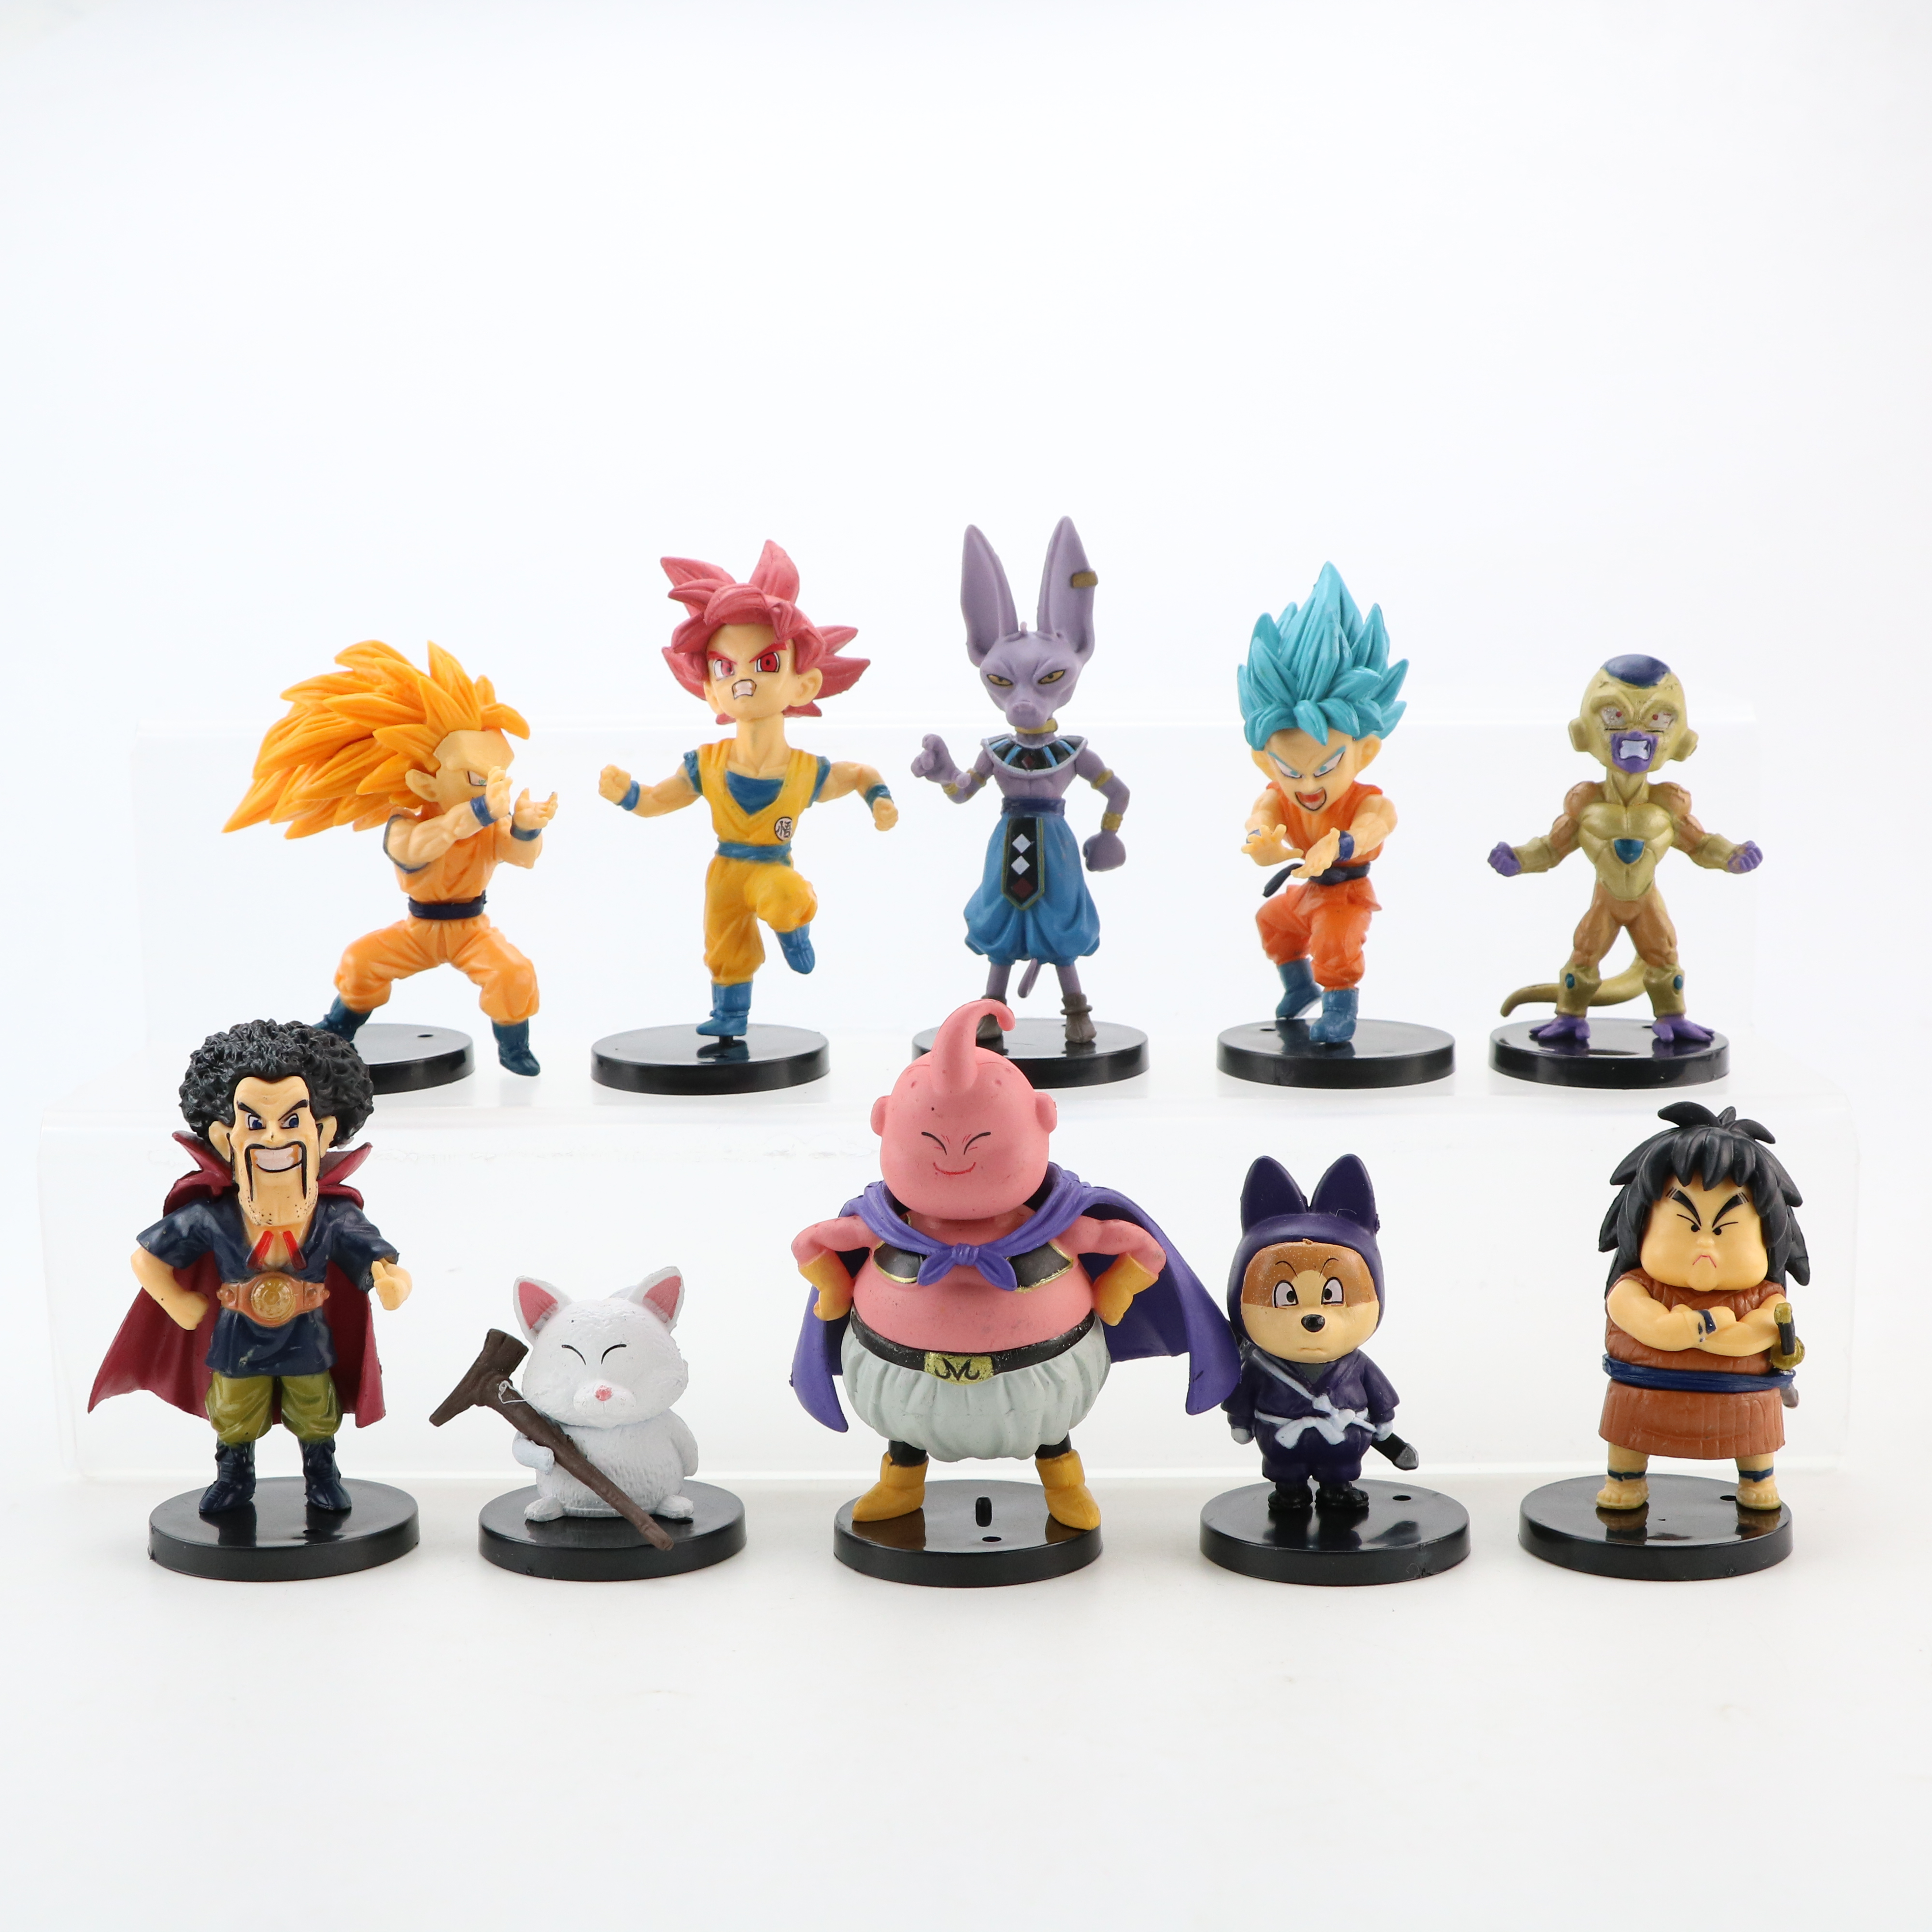 10pcs/lot Dragon Ball Gogeta Vegeta Z Son Goku Gohan Broly Trunks Frieza Majin Buu Piccolo Dragonball Action Figure Set PVC ToysAction & Toy Figures   -